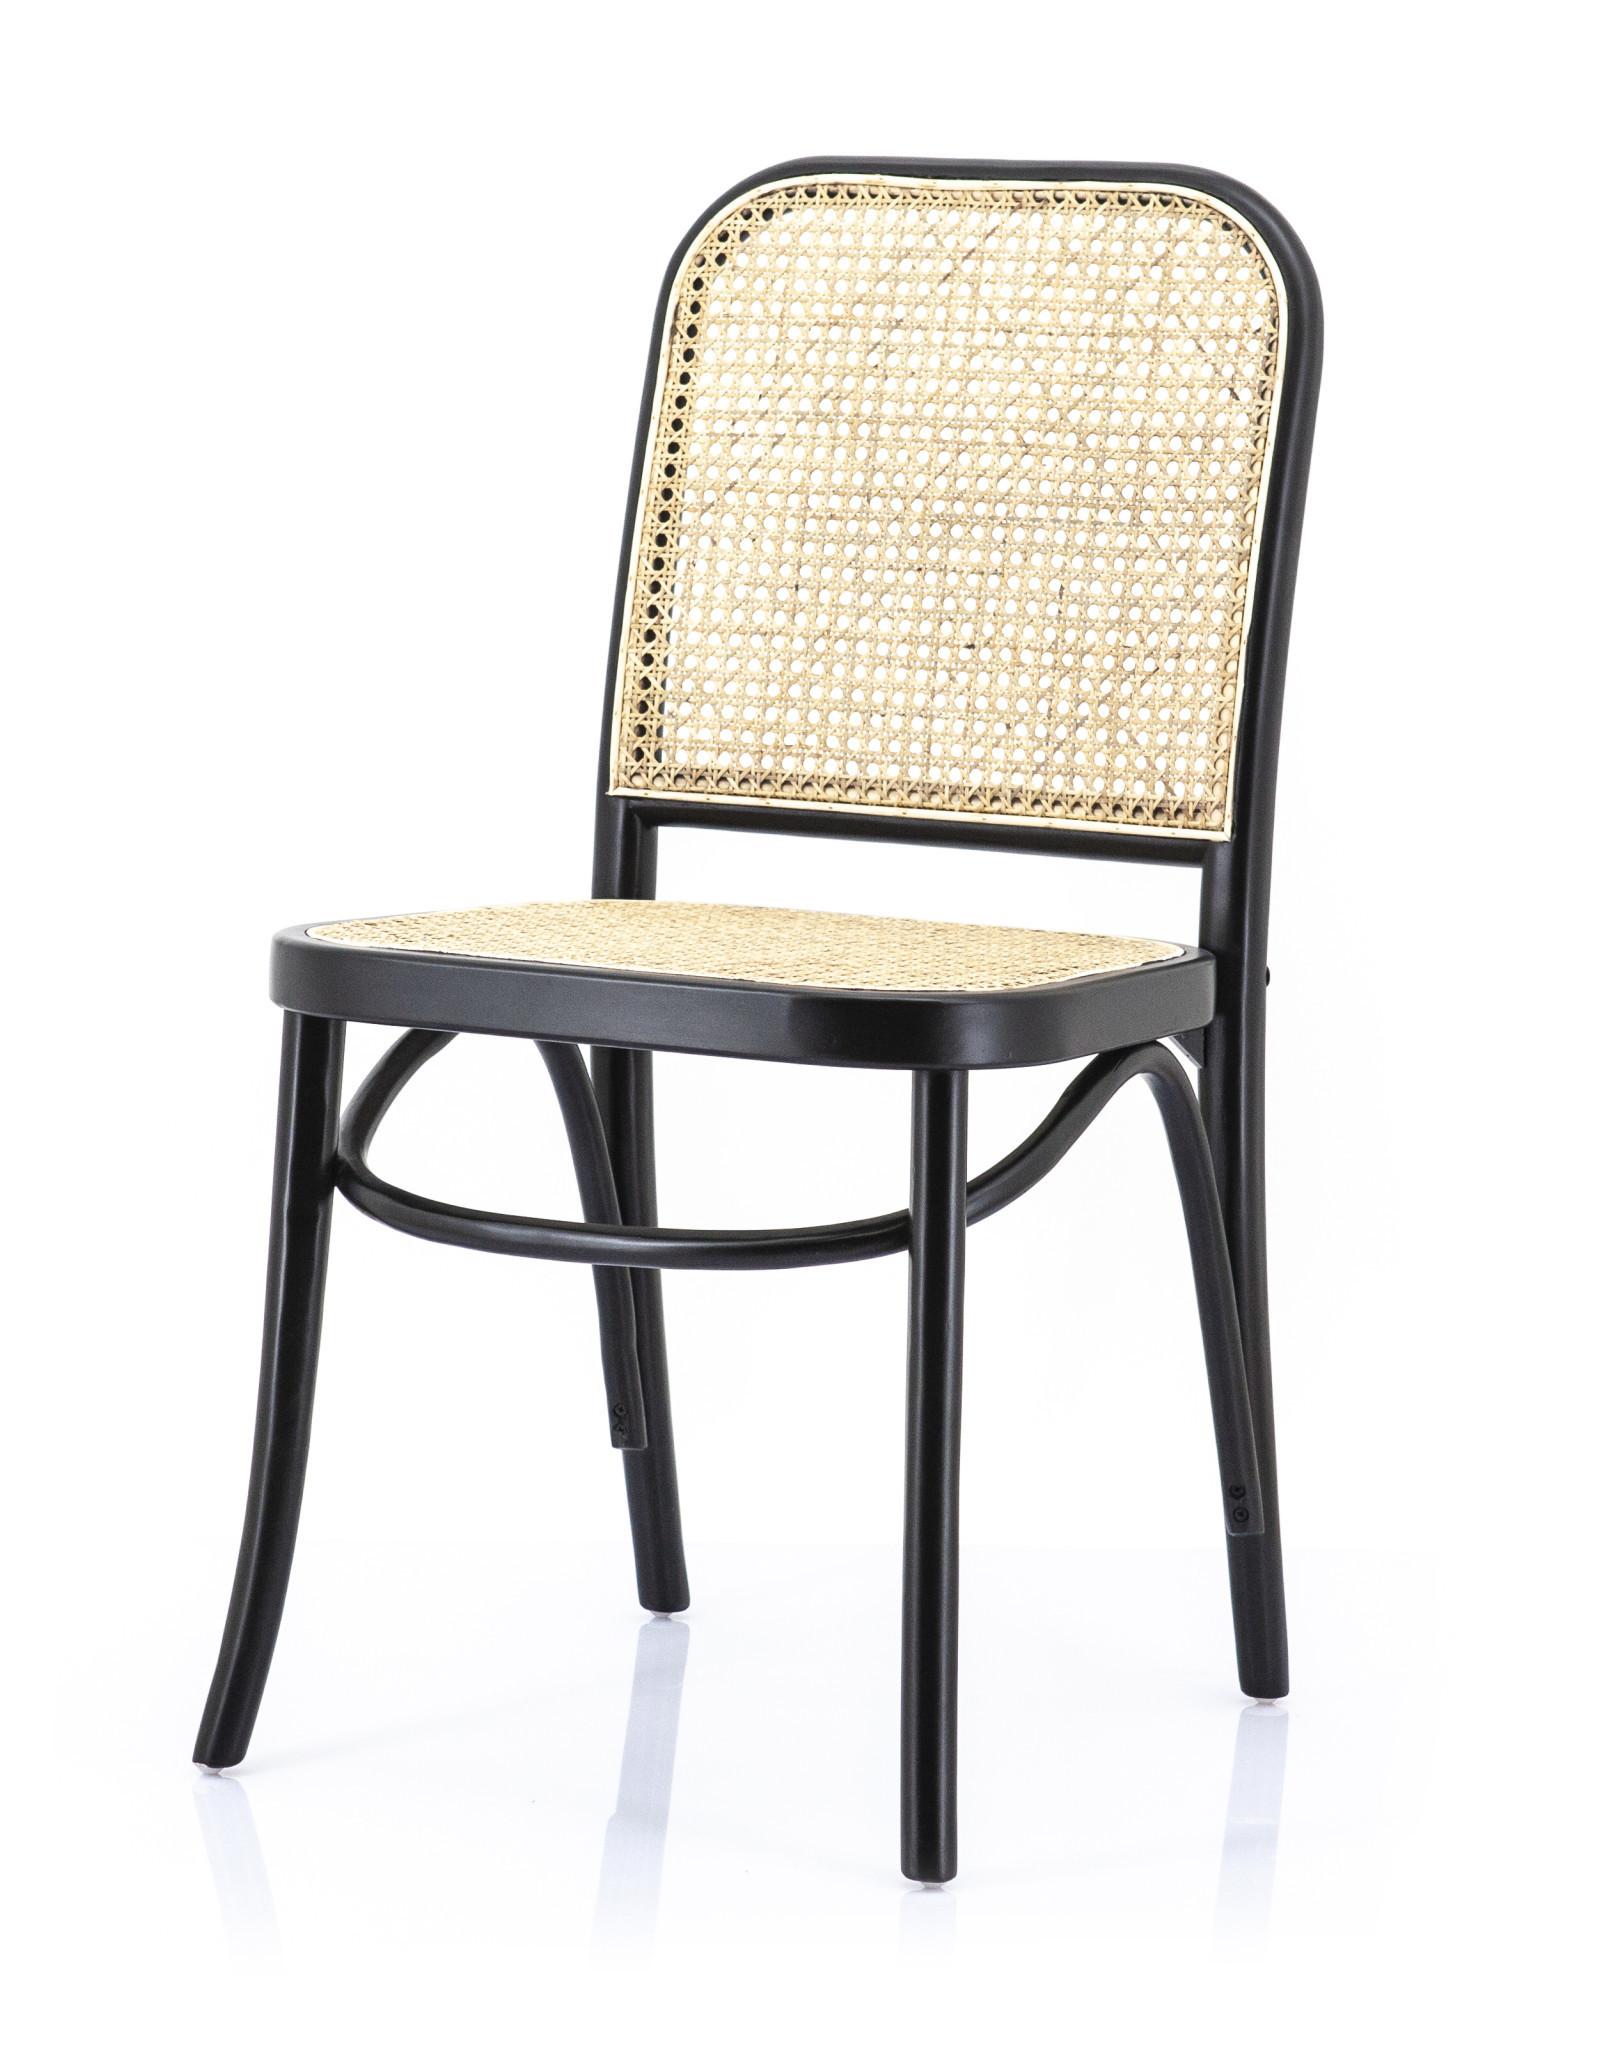 Stoel Webbing - Cane Chair